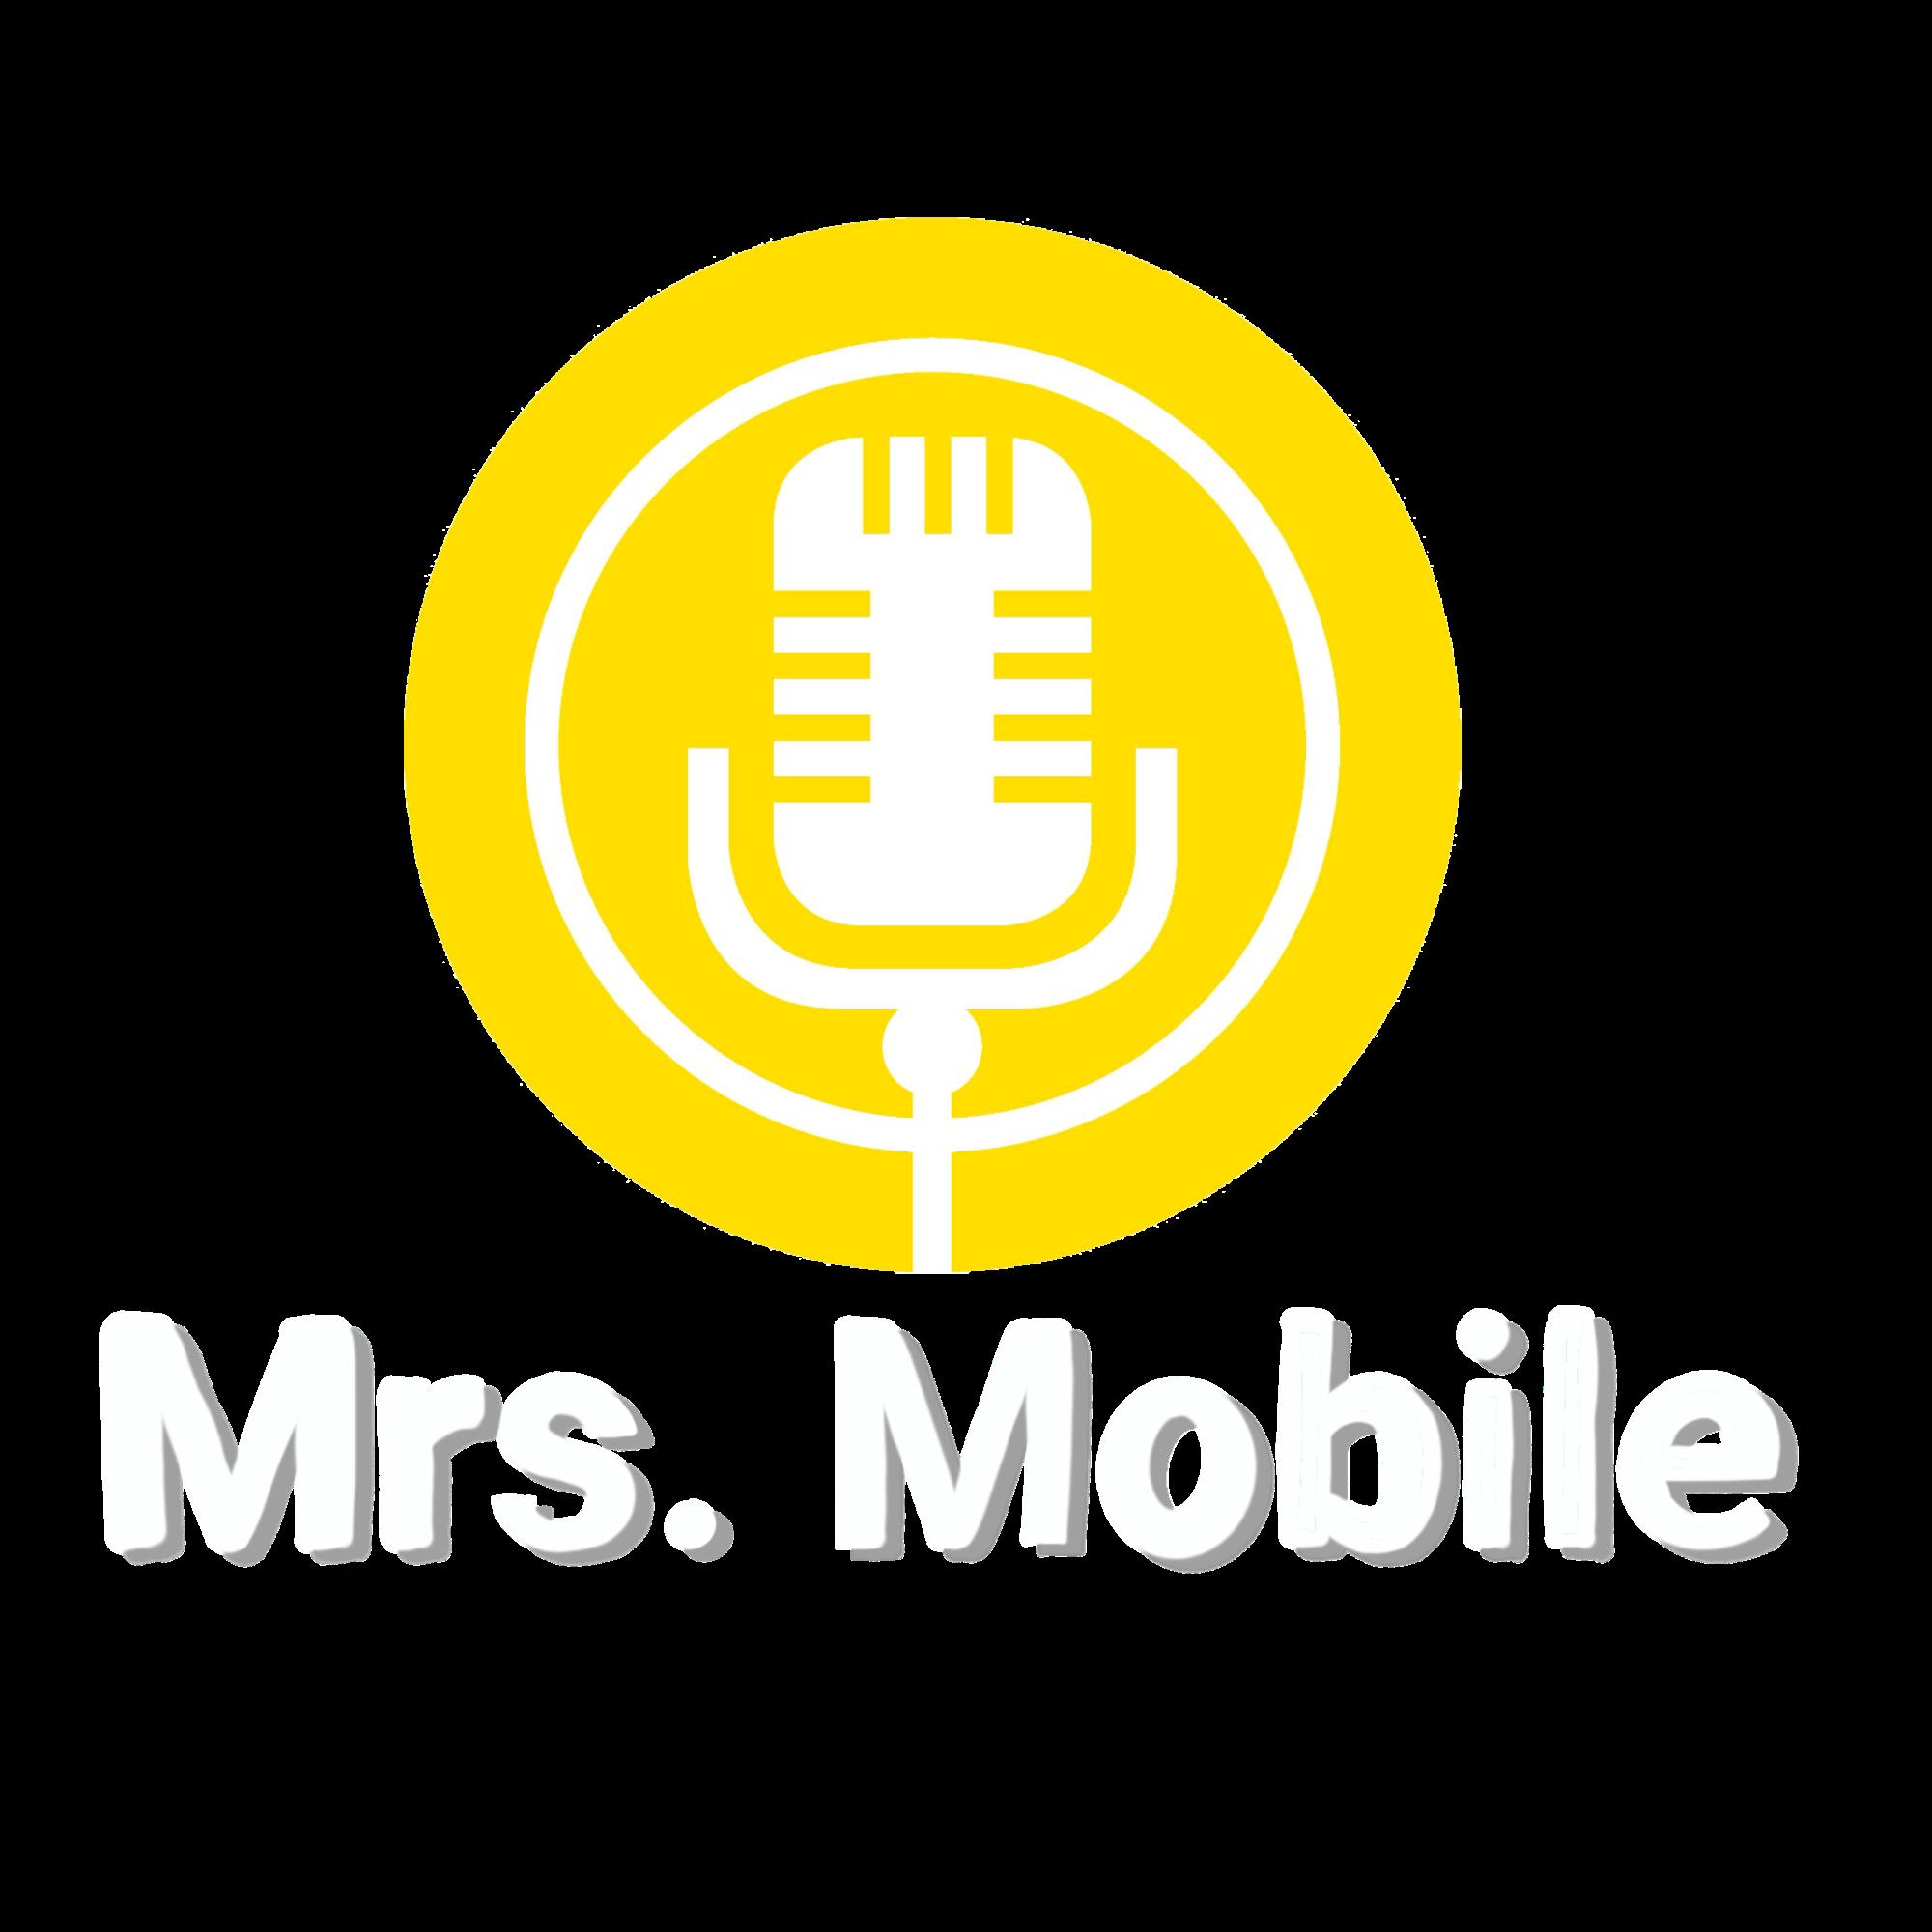 Mrs. Mobile